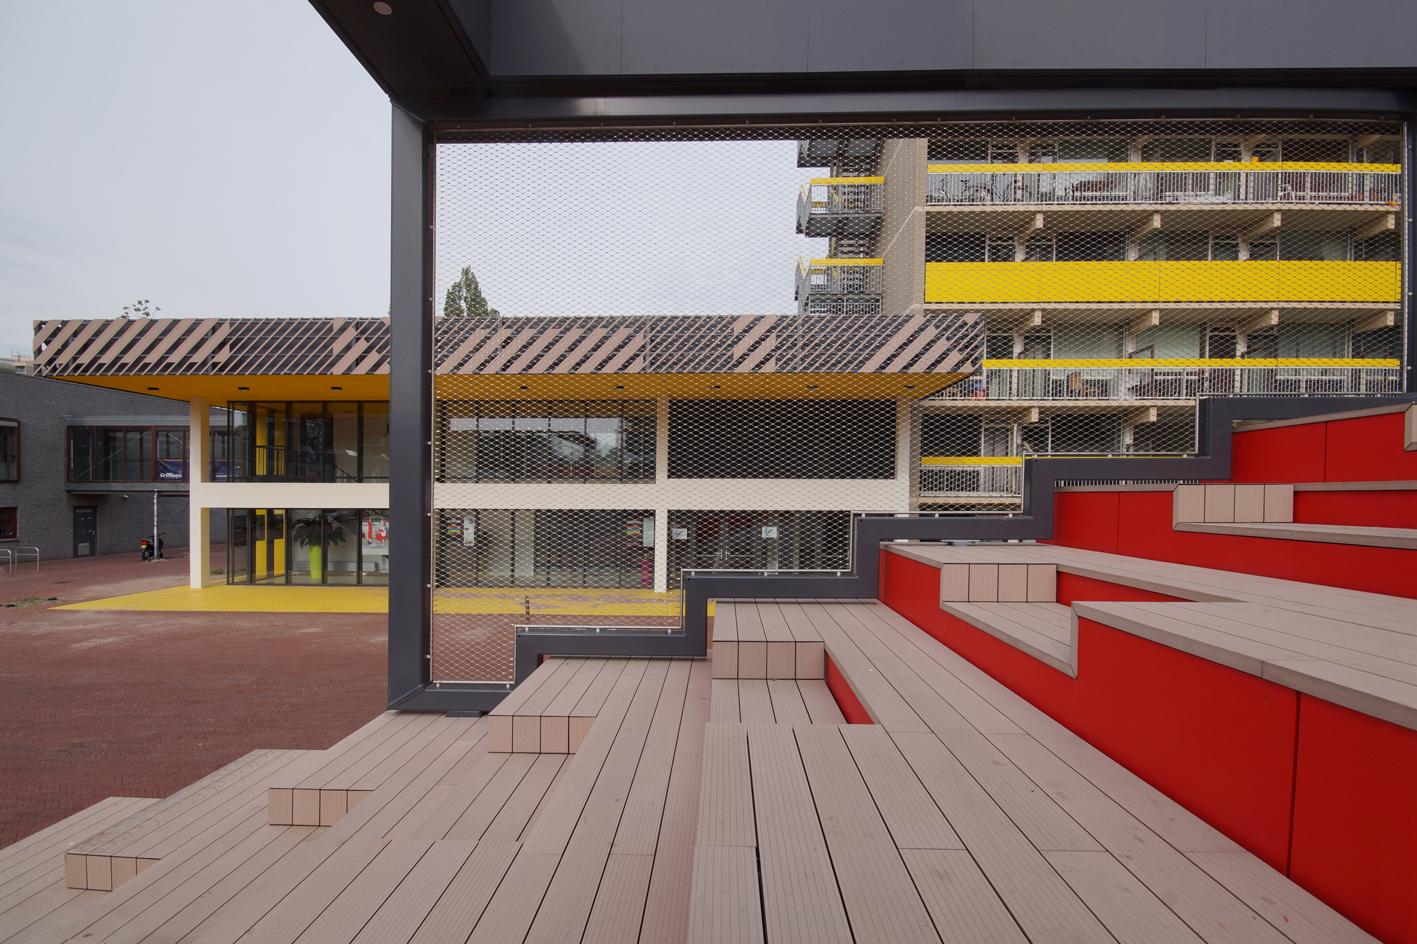 Campus Uilenstede